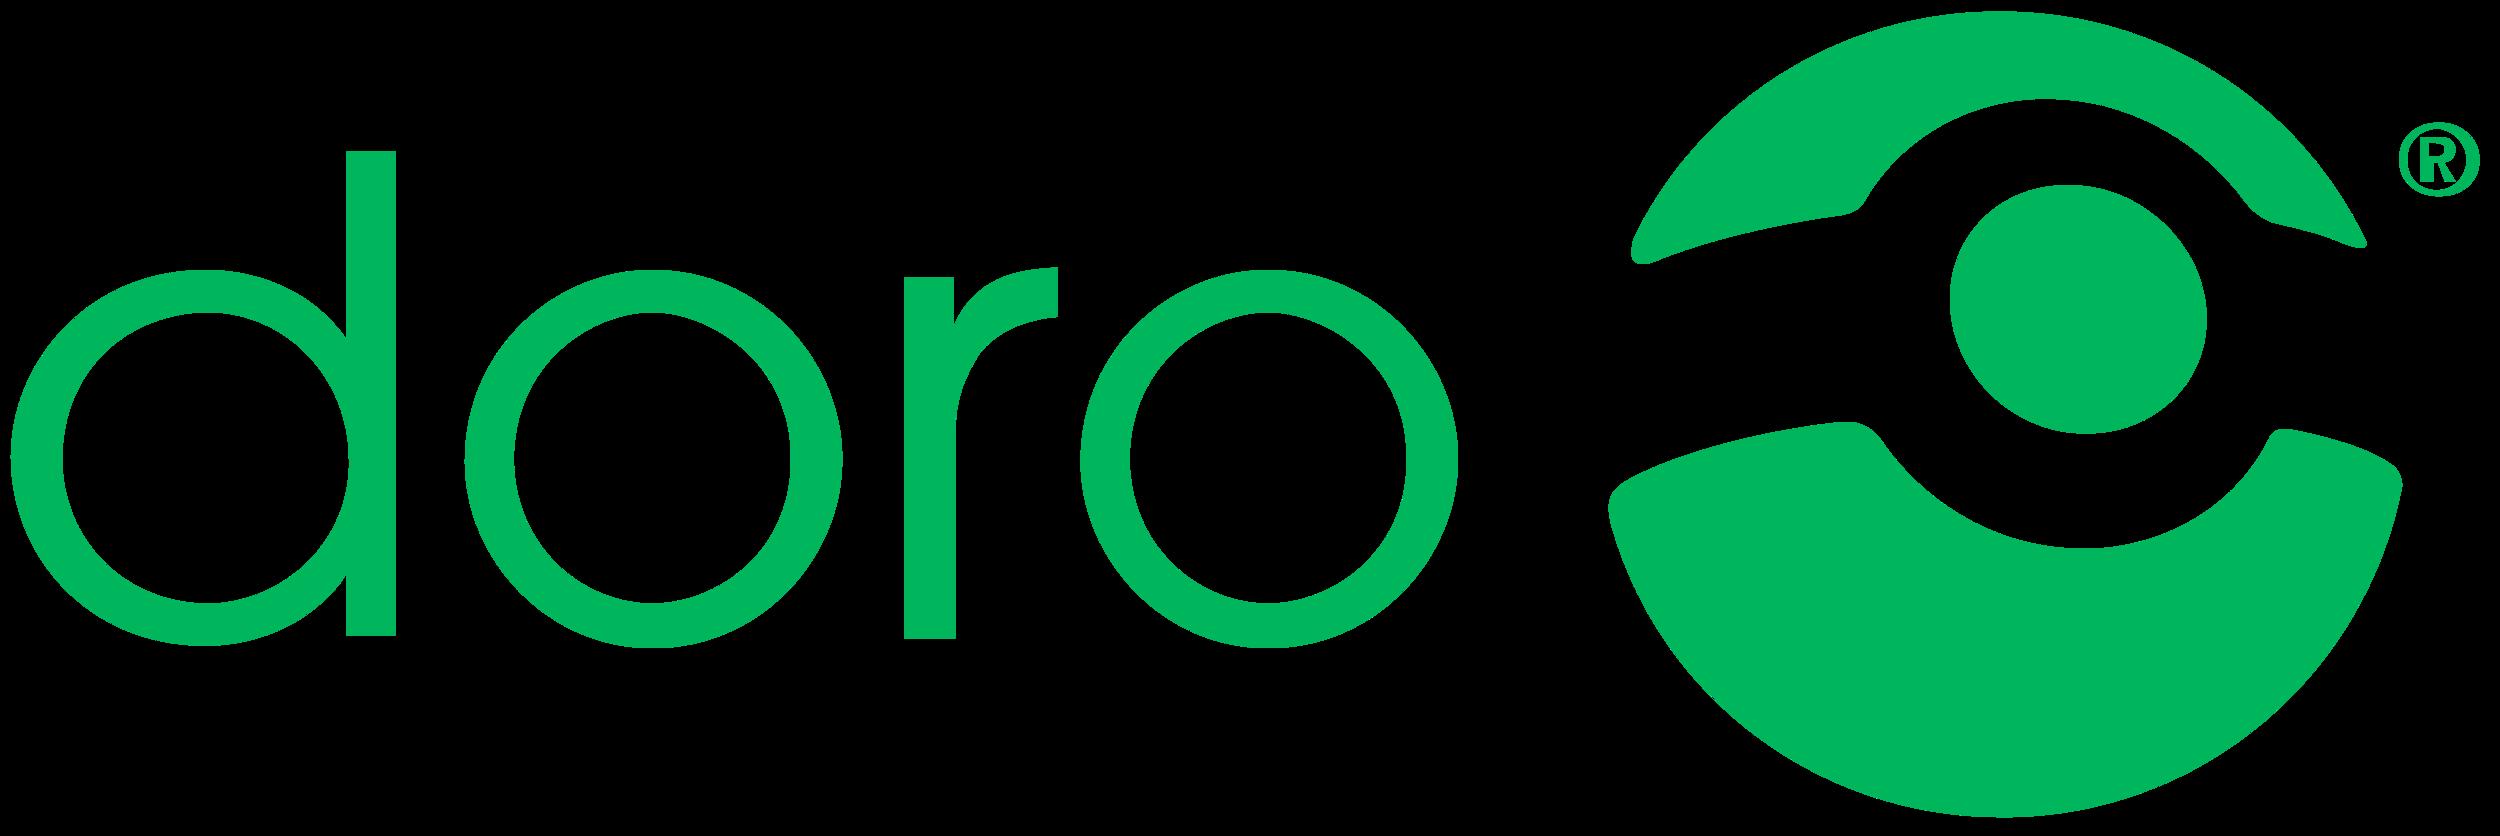 Doro_logo.png